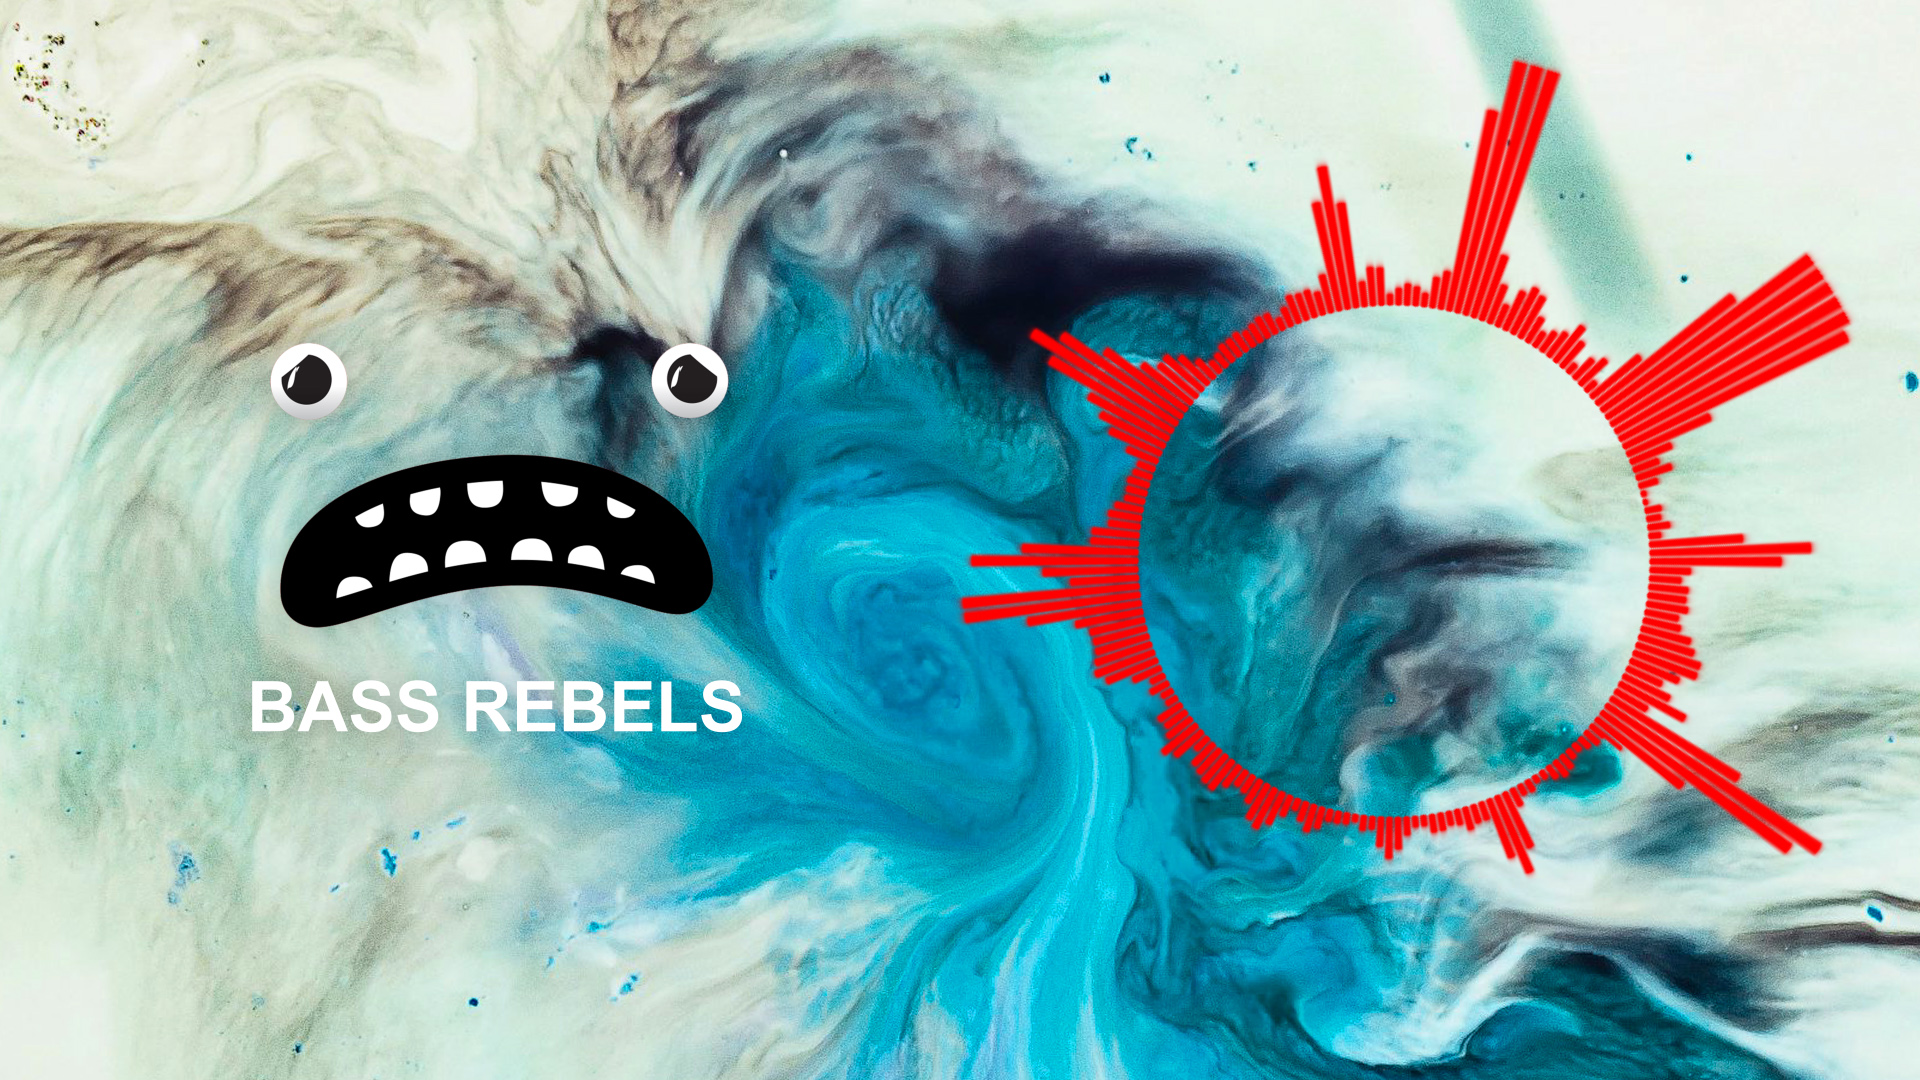 x1rox - Unison [Bass Rebels Release] Upbeat Music No Copyright